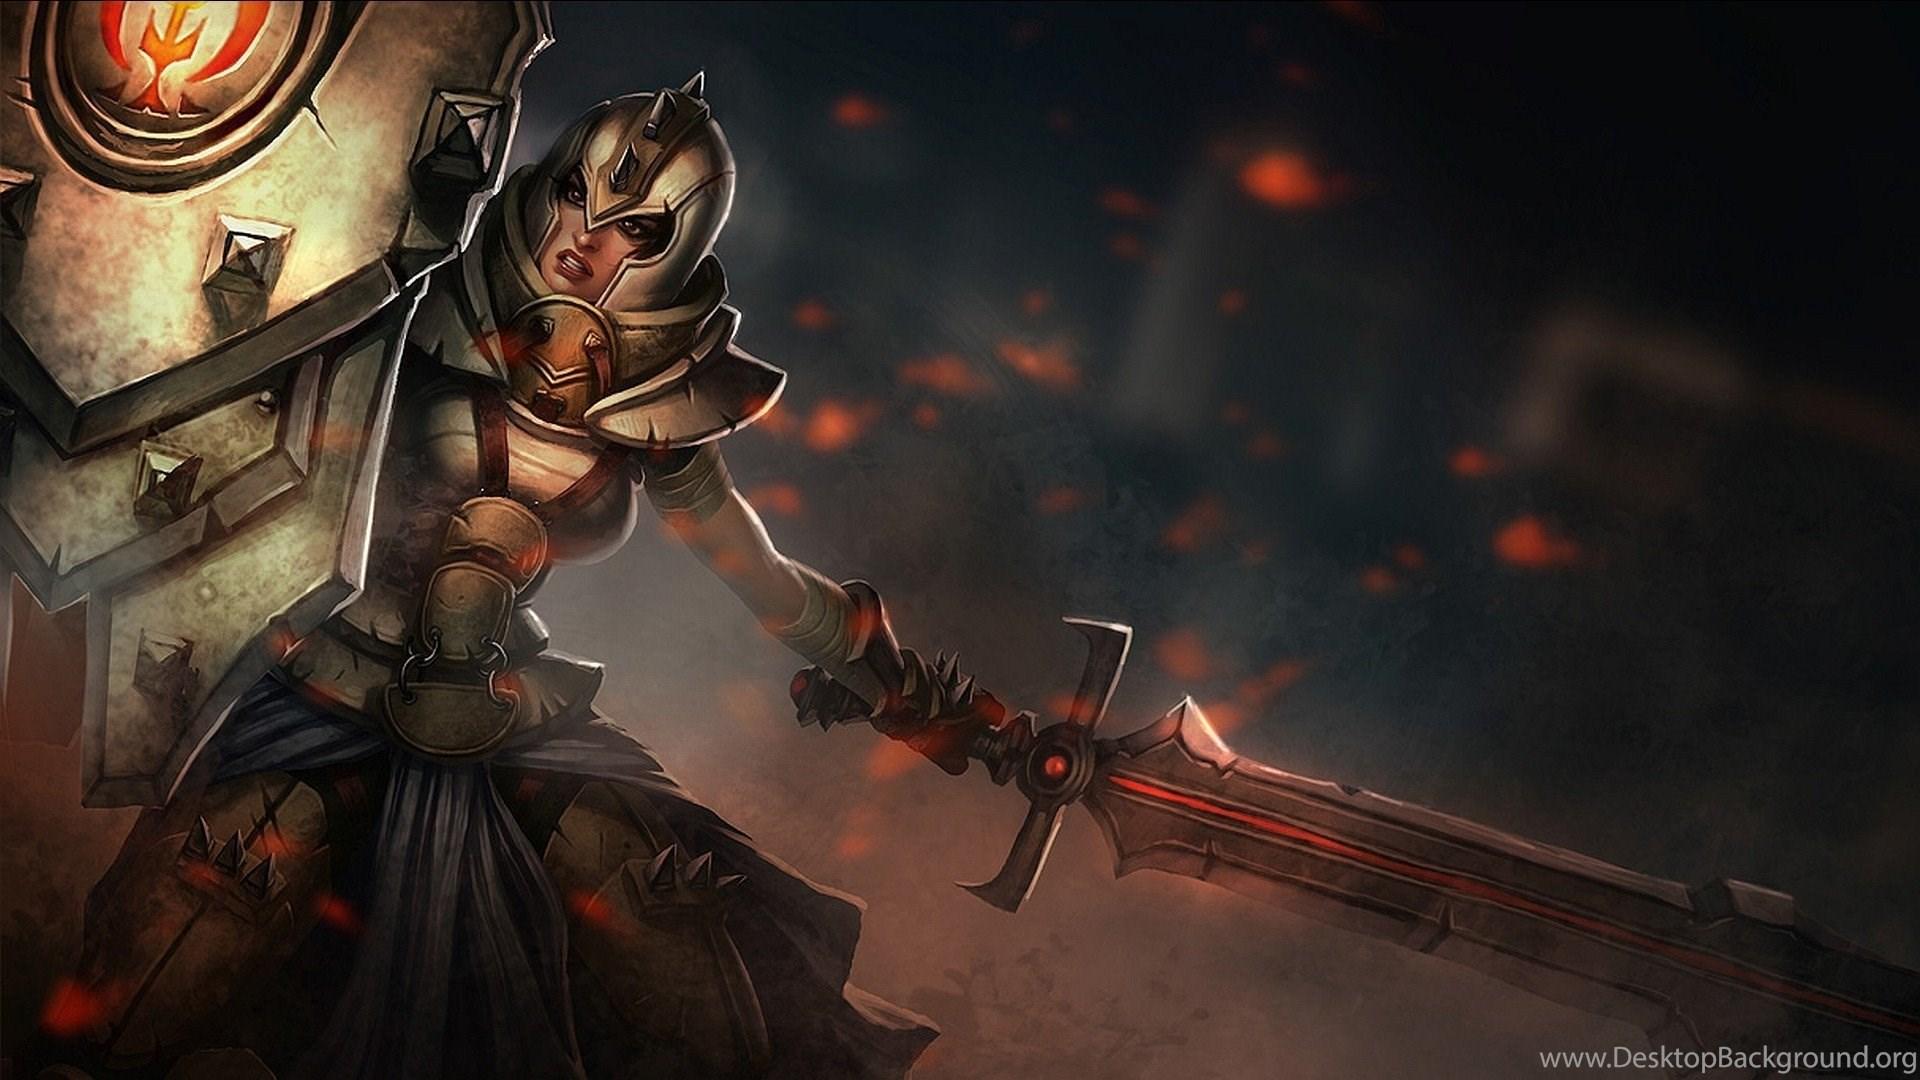 League Of Legends Leona Wallpapers Hd Desktop Background